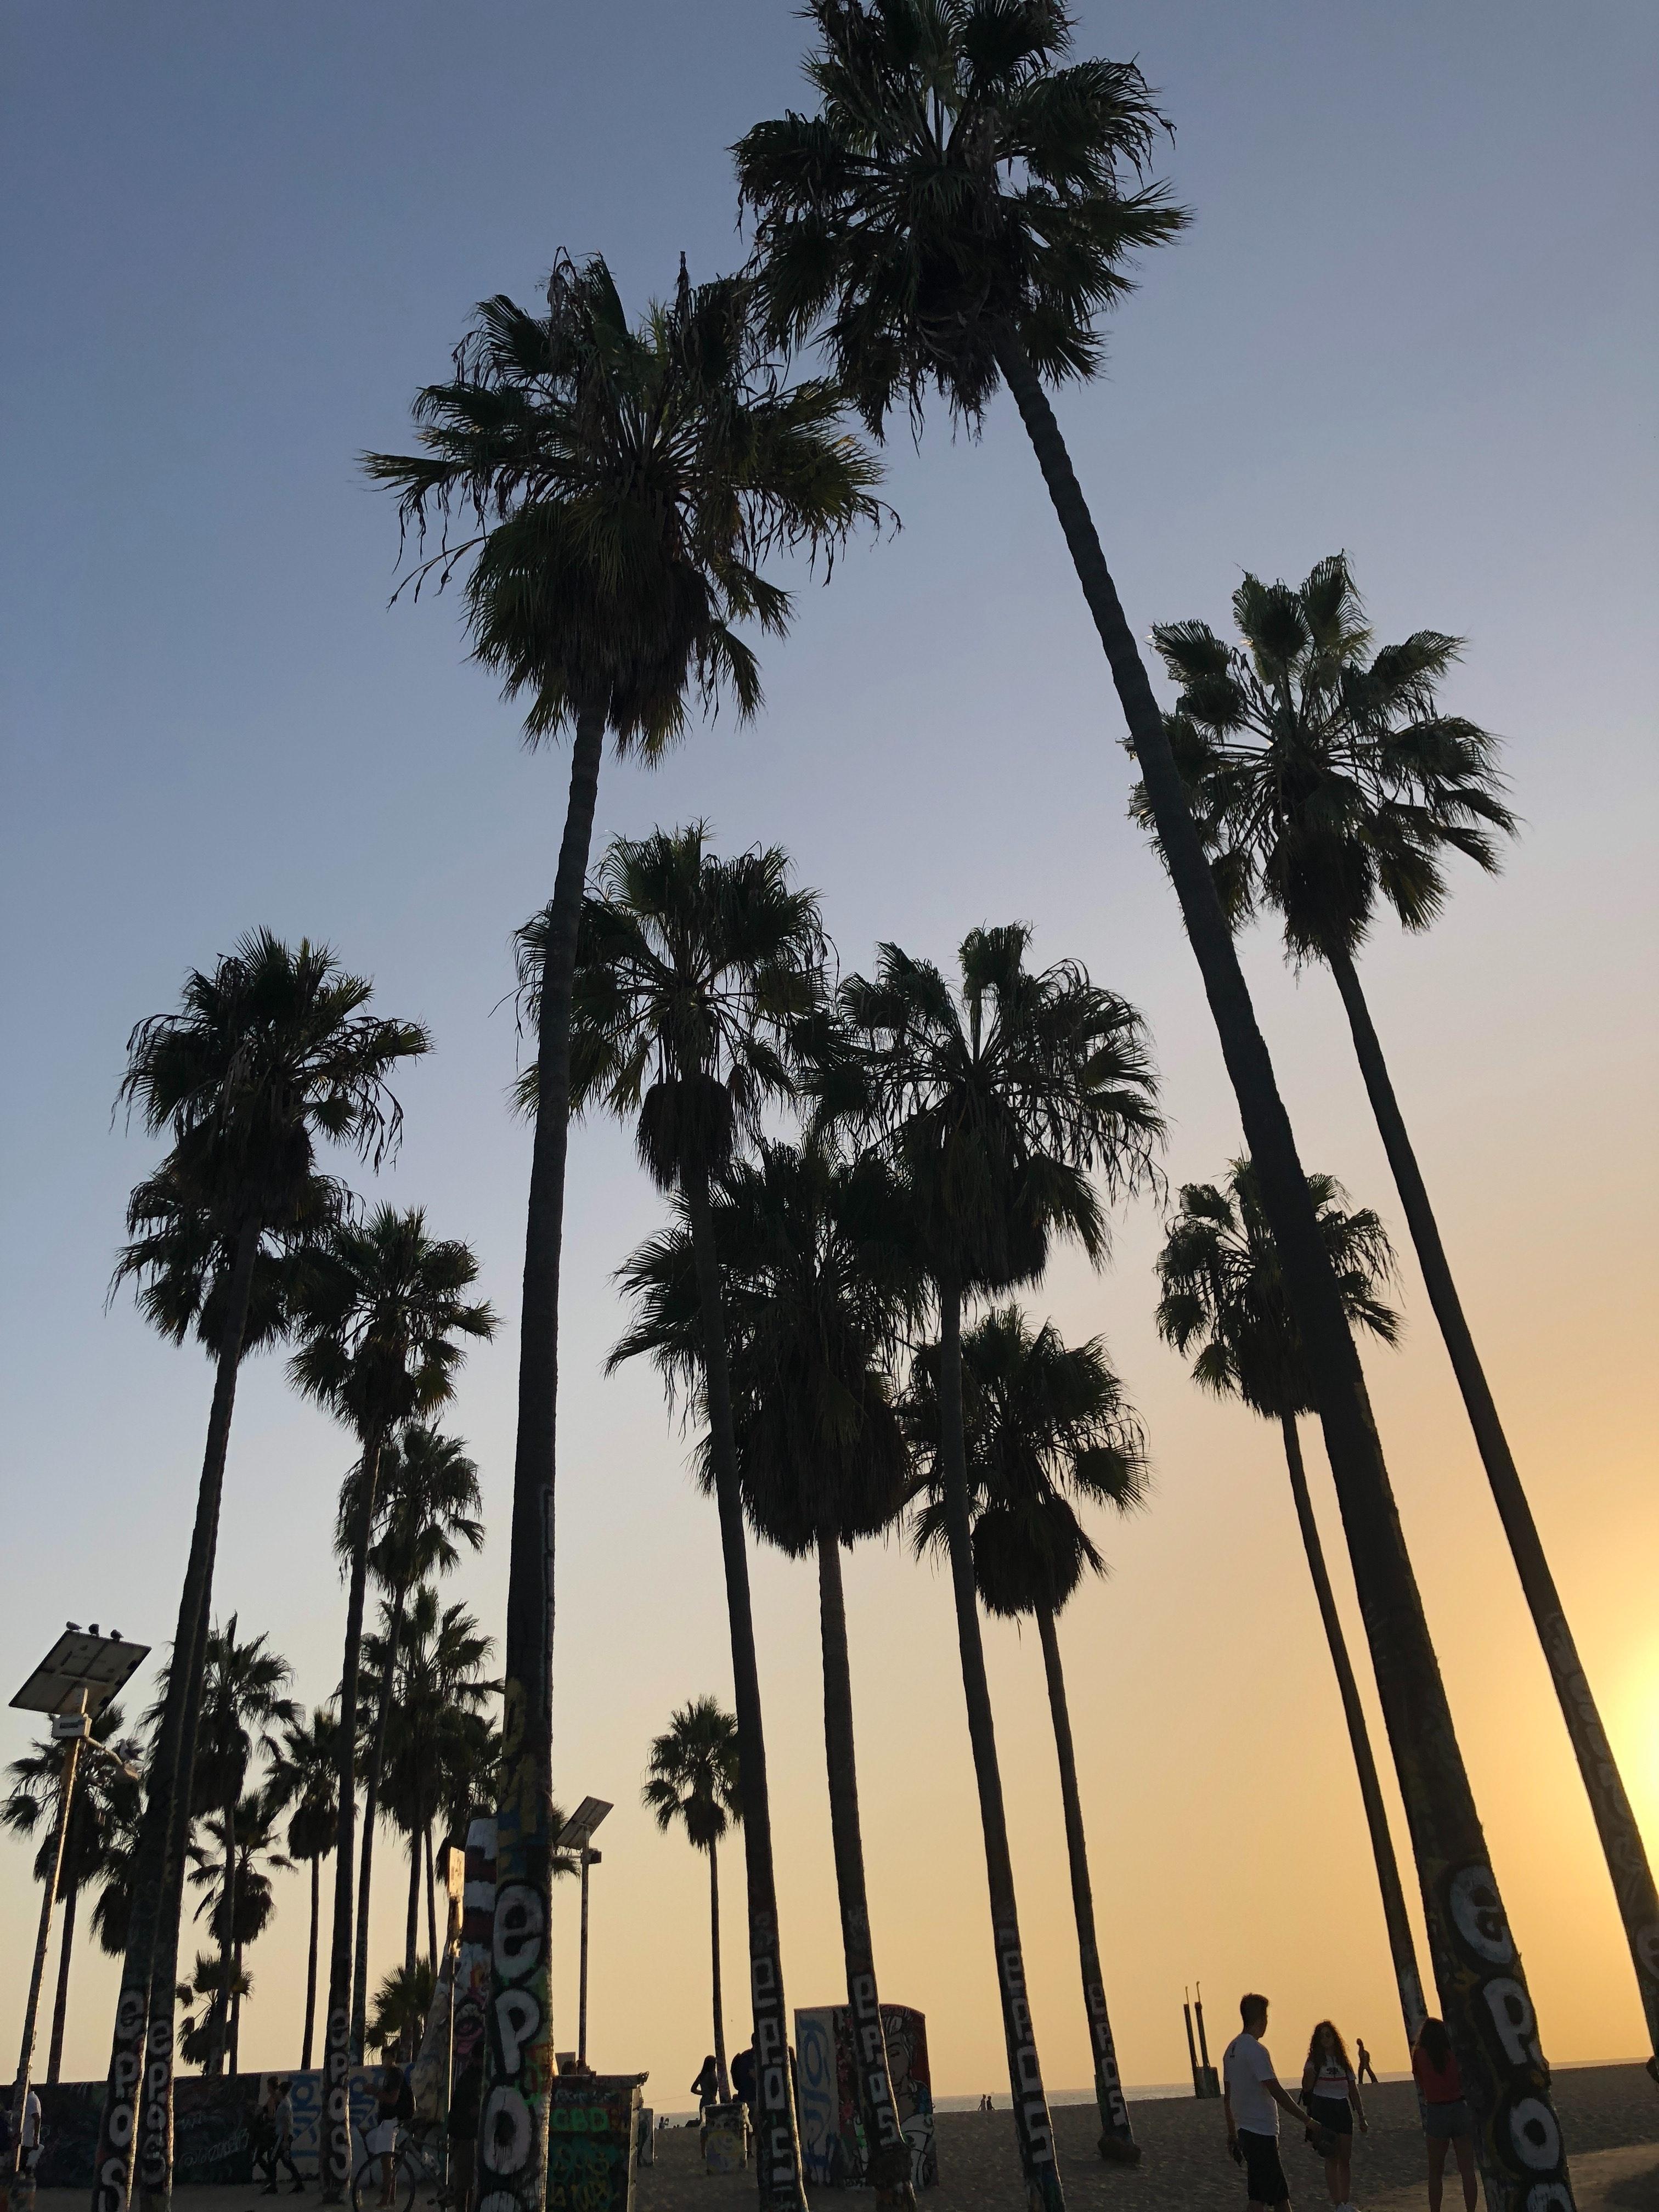 Foto Gratuita Di Los Angeles Natura Palma